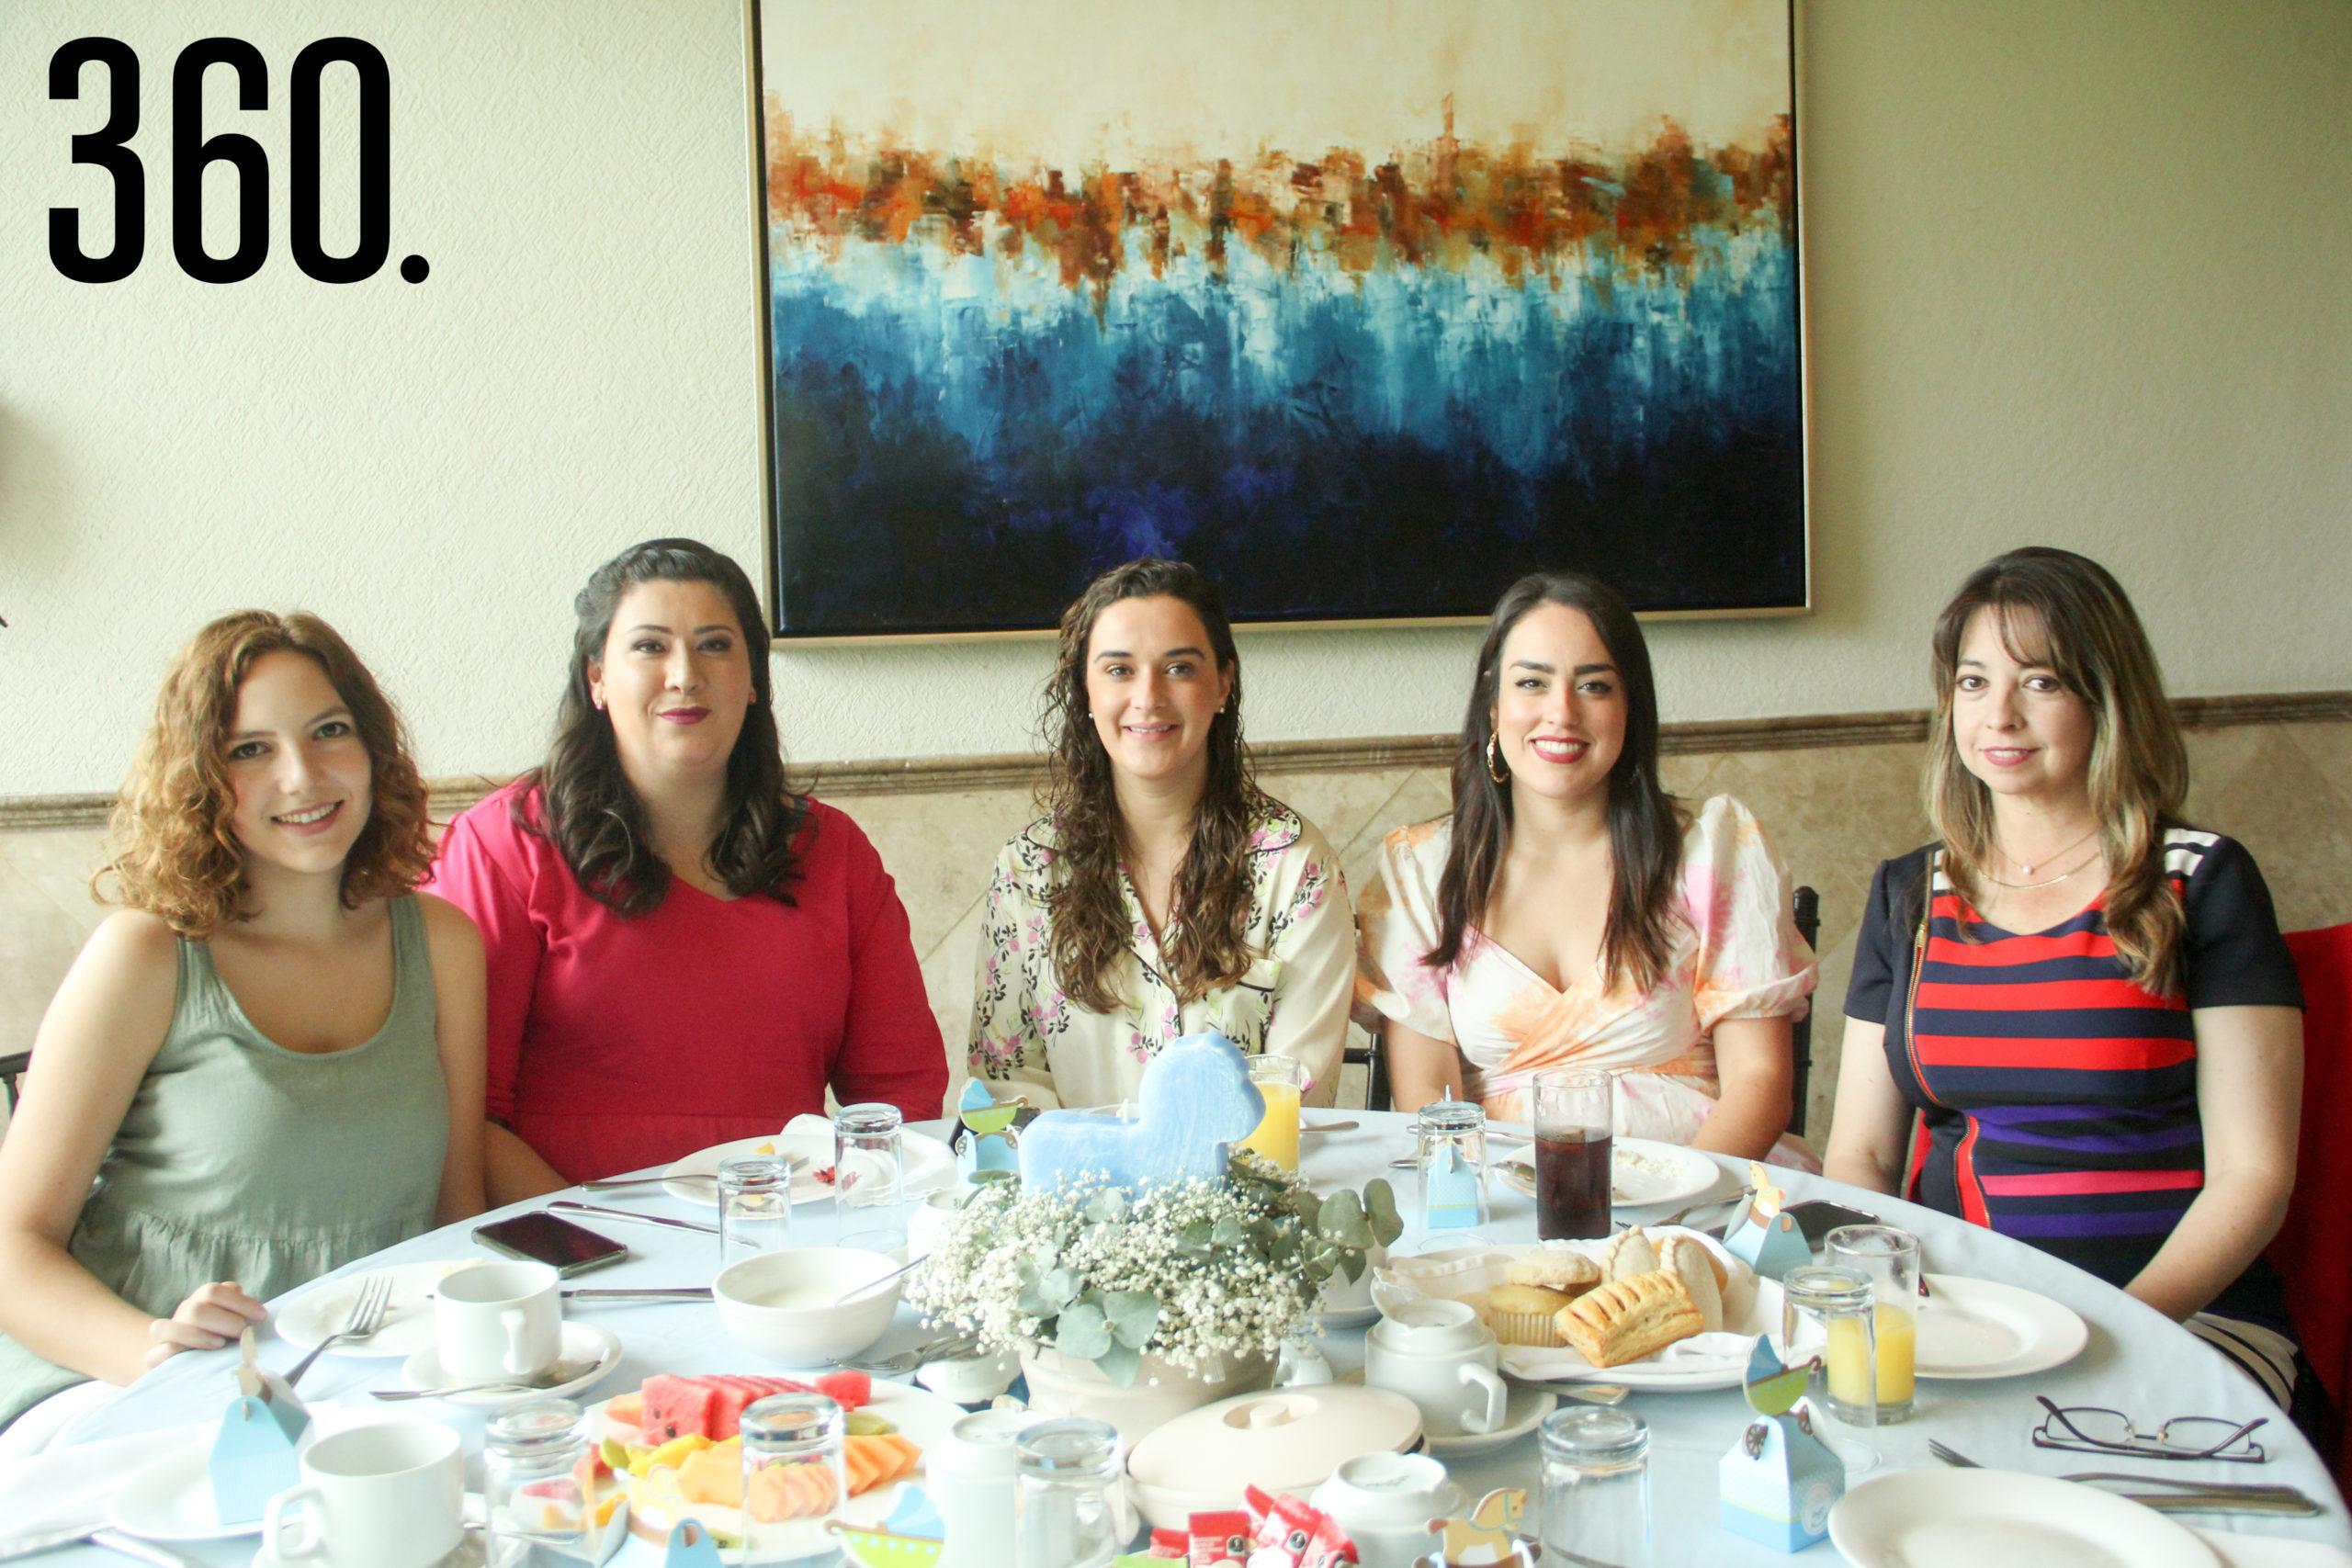 Andrea castilla, Nélida Villarreal, Ana Lucía Paz, Ilsse Garza y Lily Martínez.